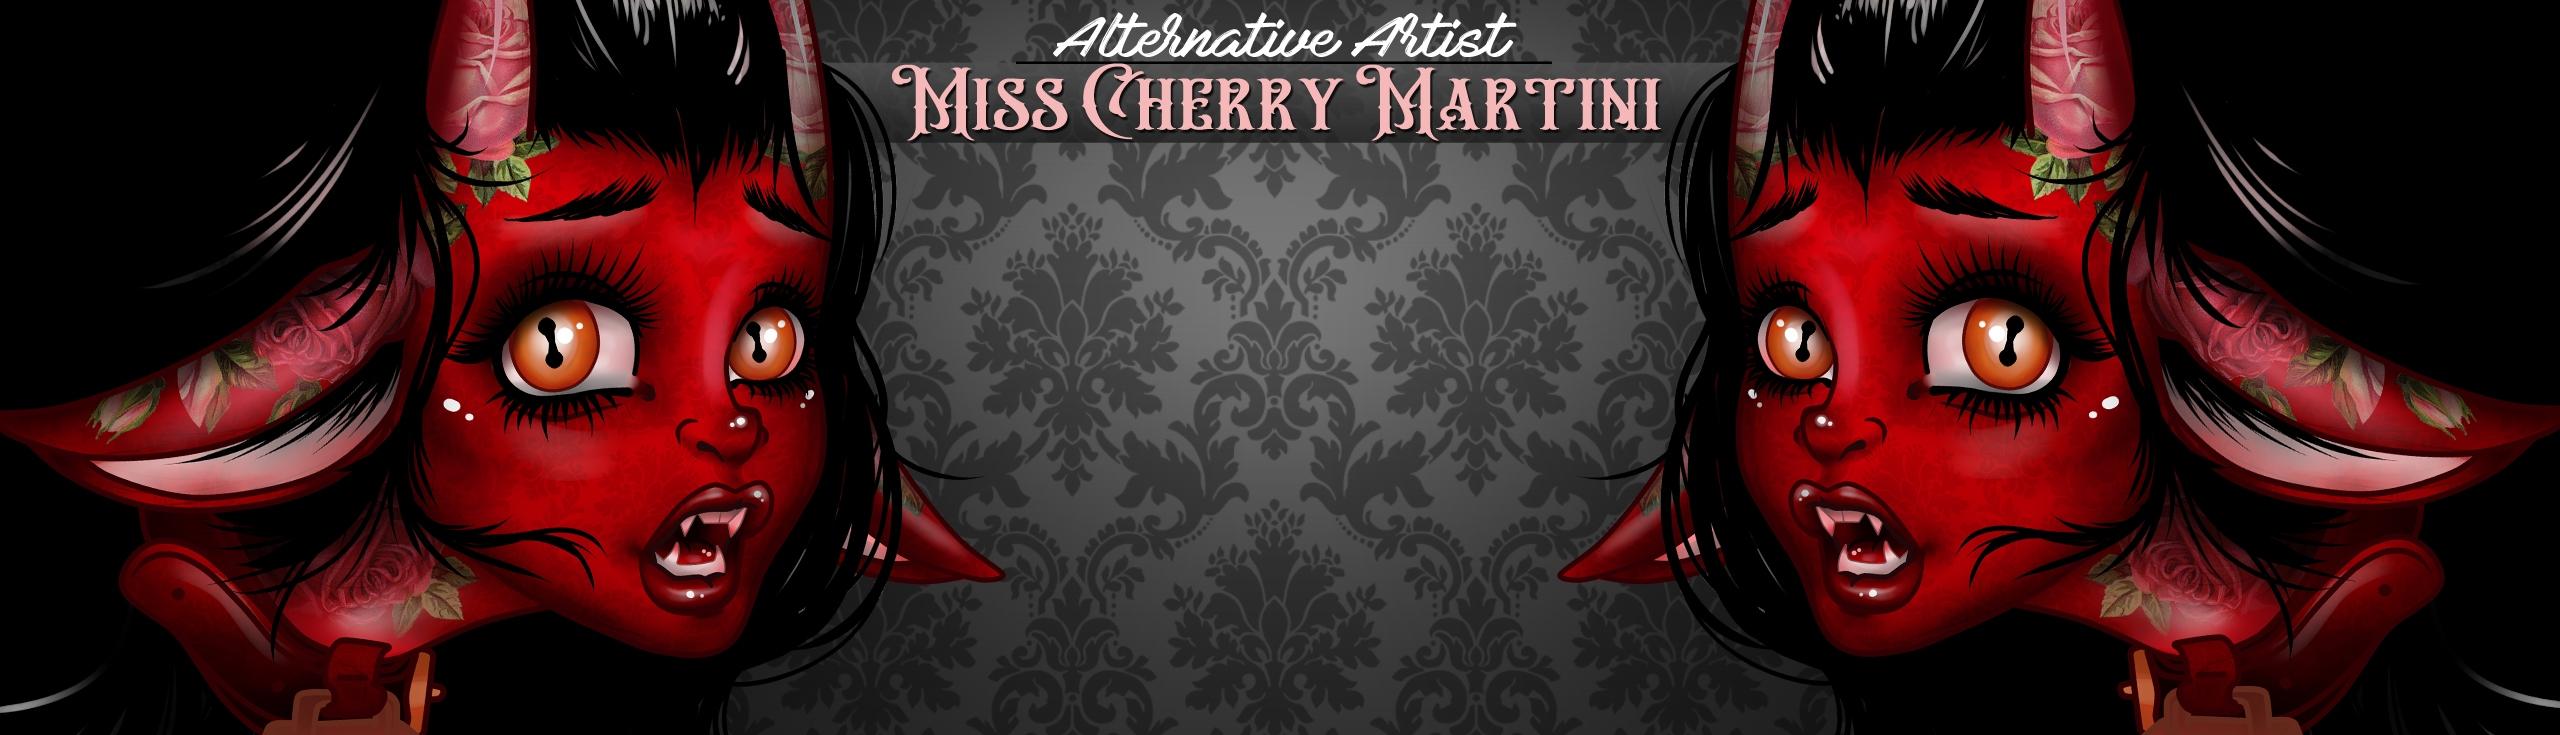 Miss Cherry Martini (@misscherrymartini) Cover Image